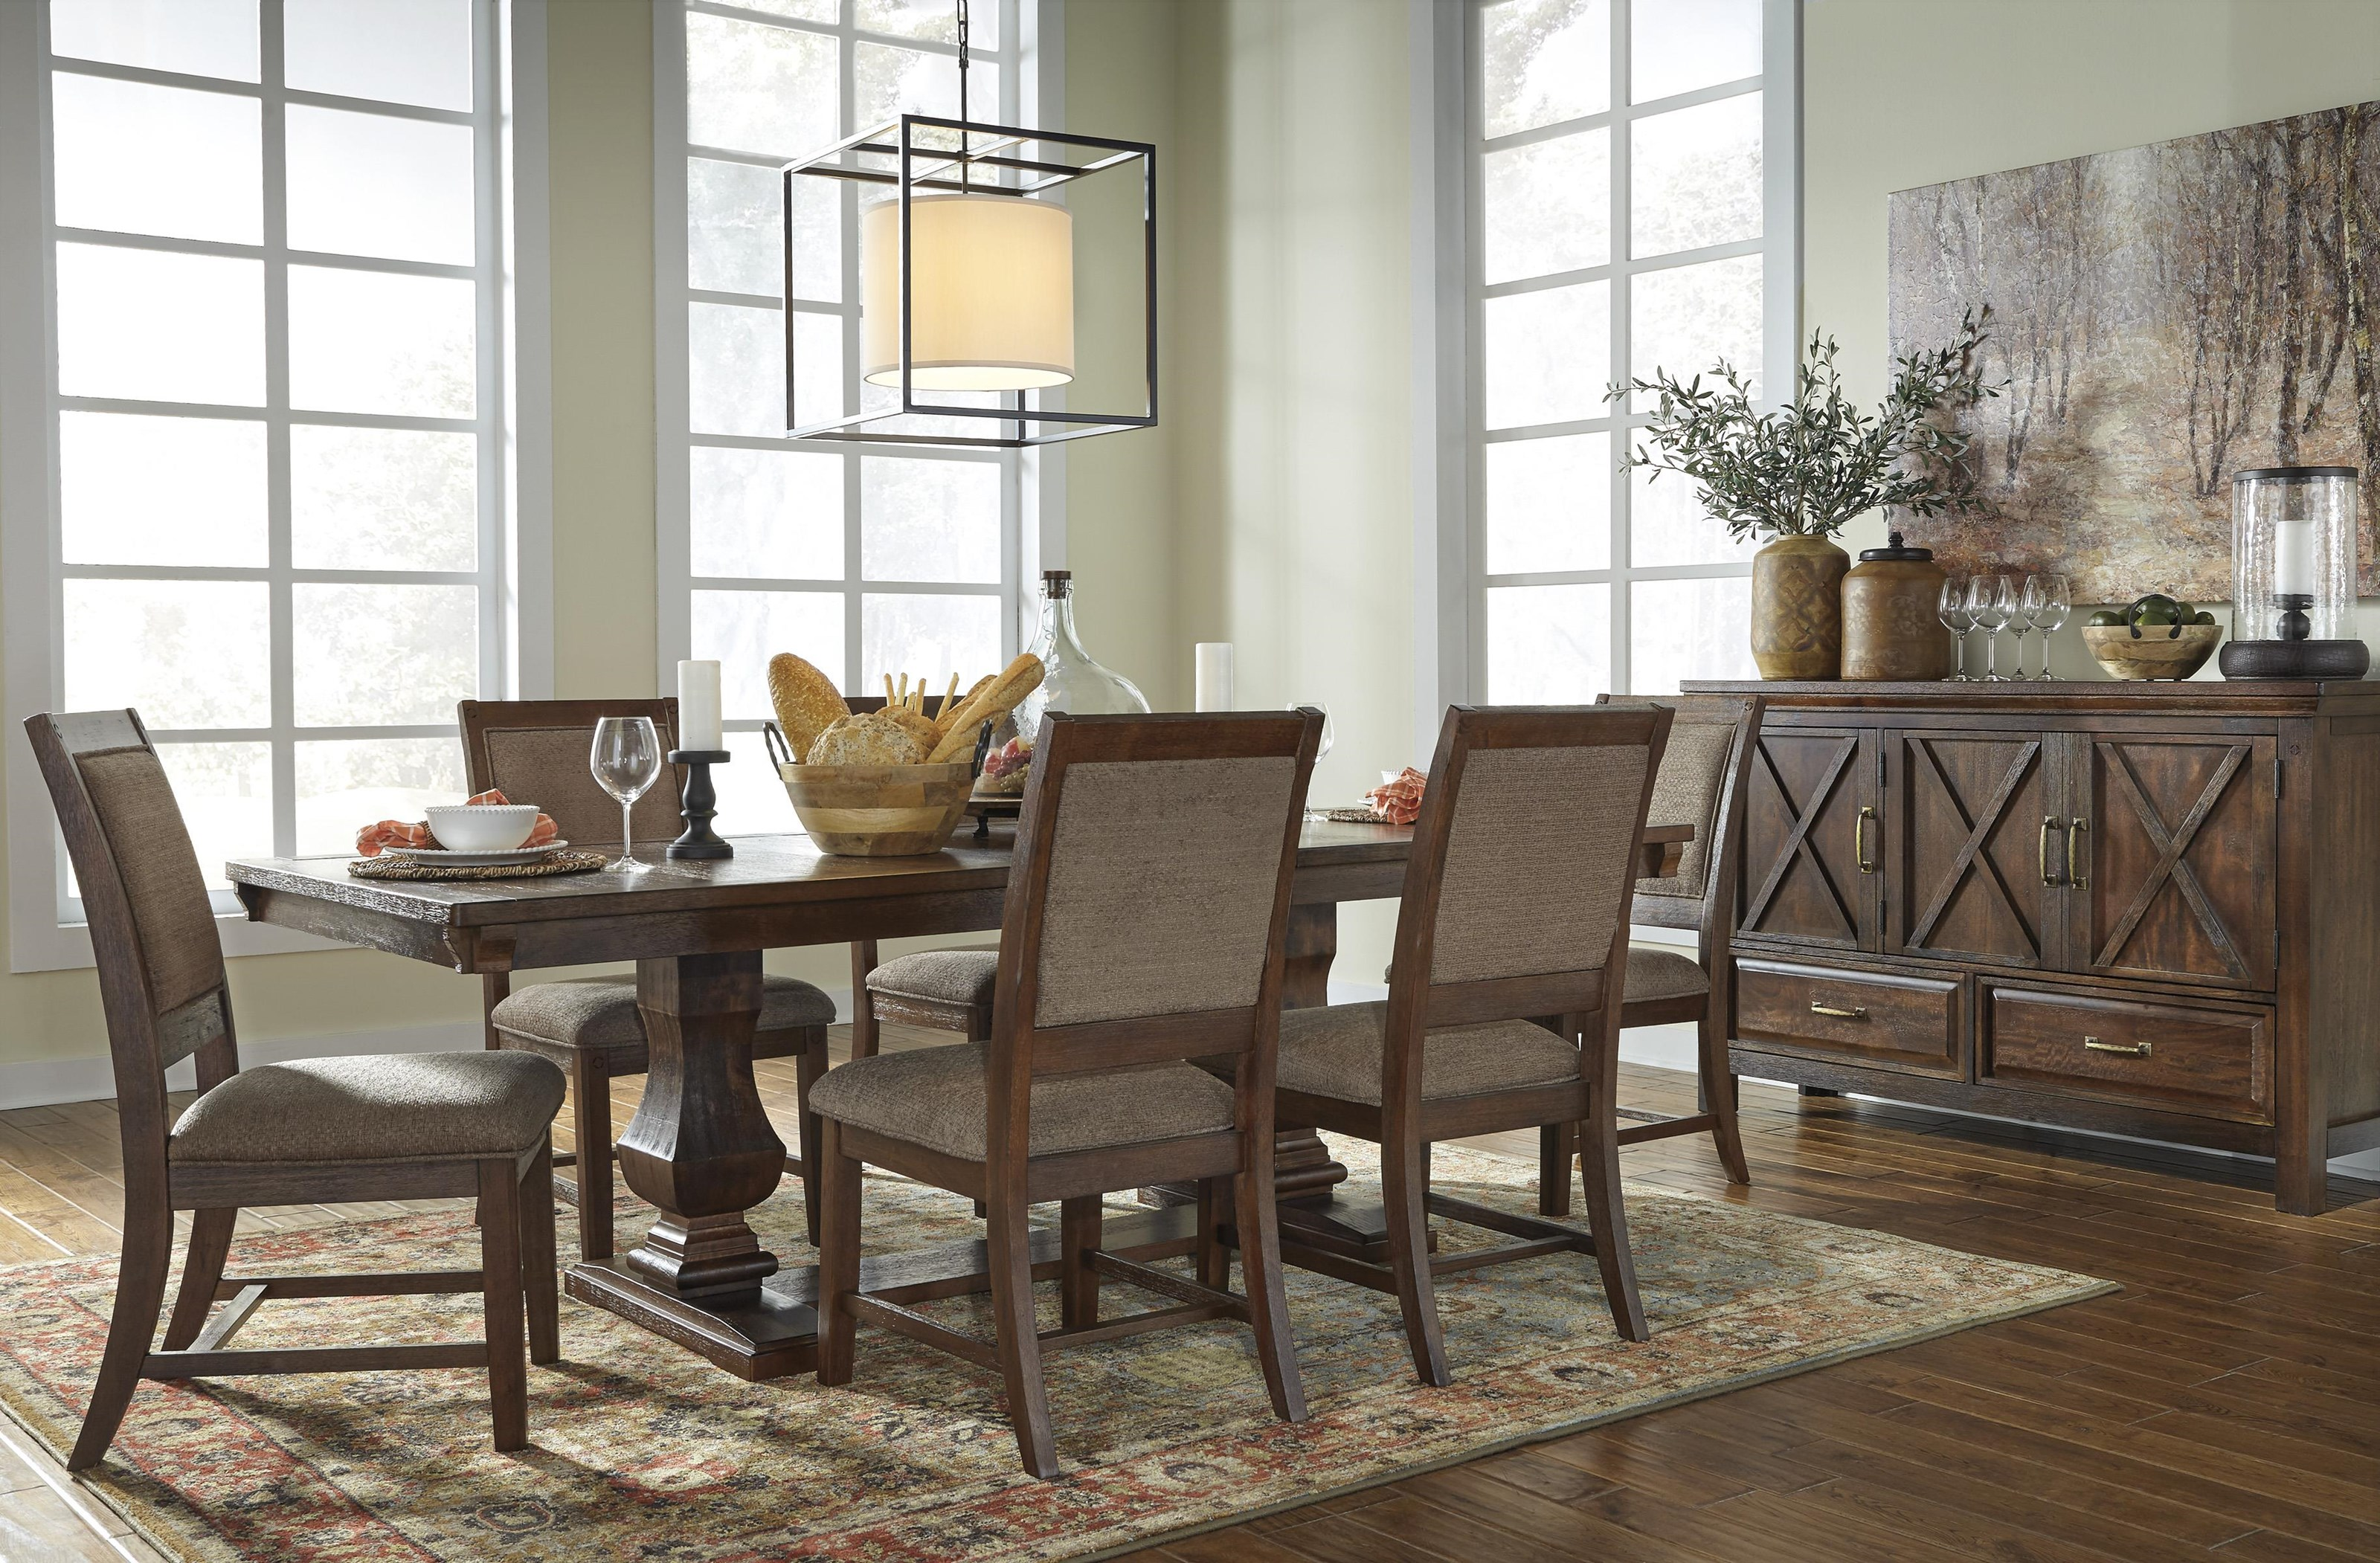 Windville 8 PC Dining Room Set by Millennium at Sam Levitz Furniture